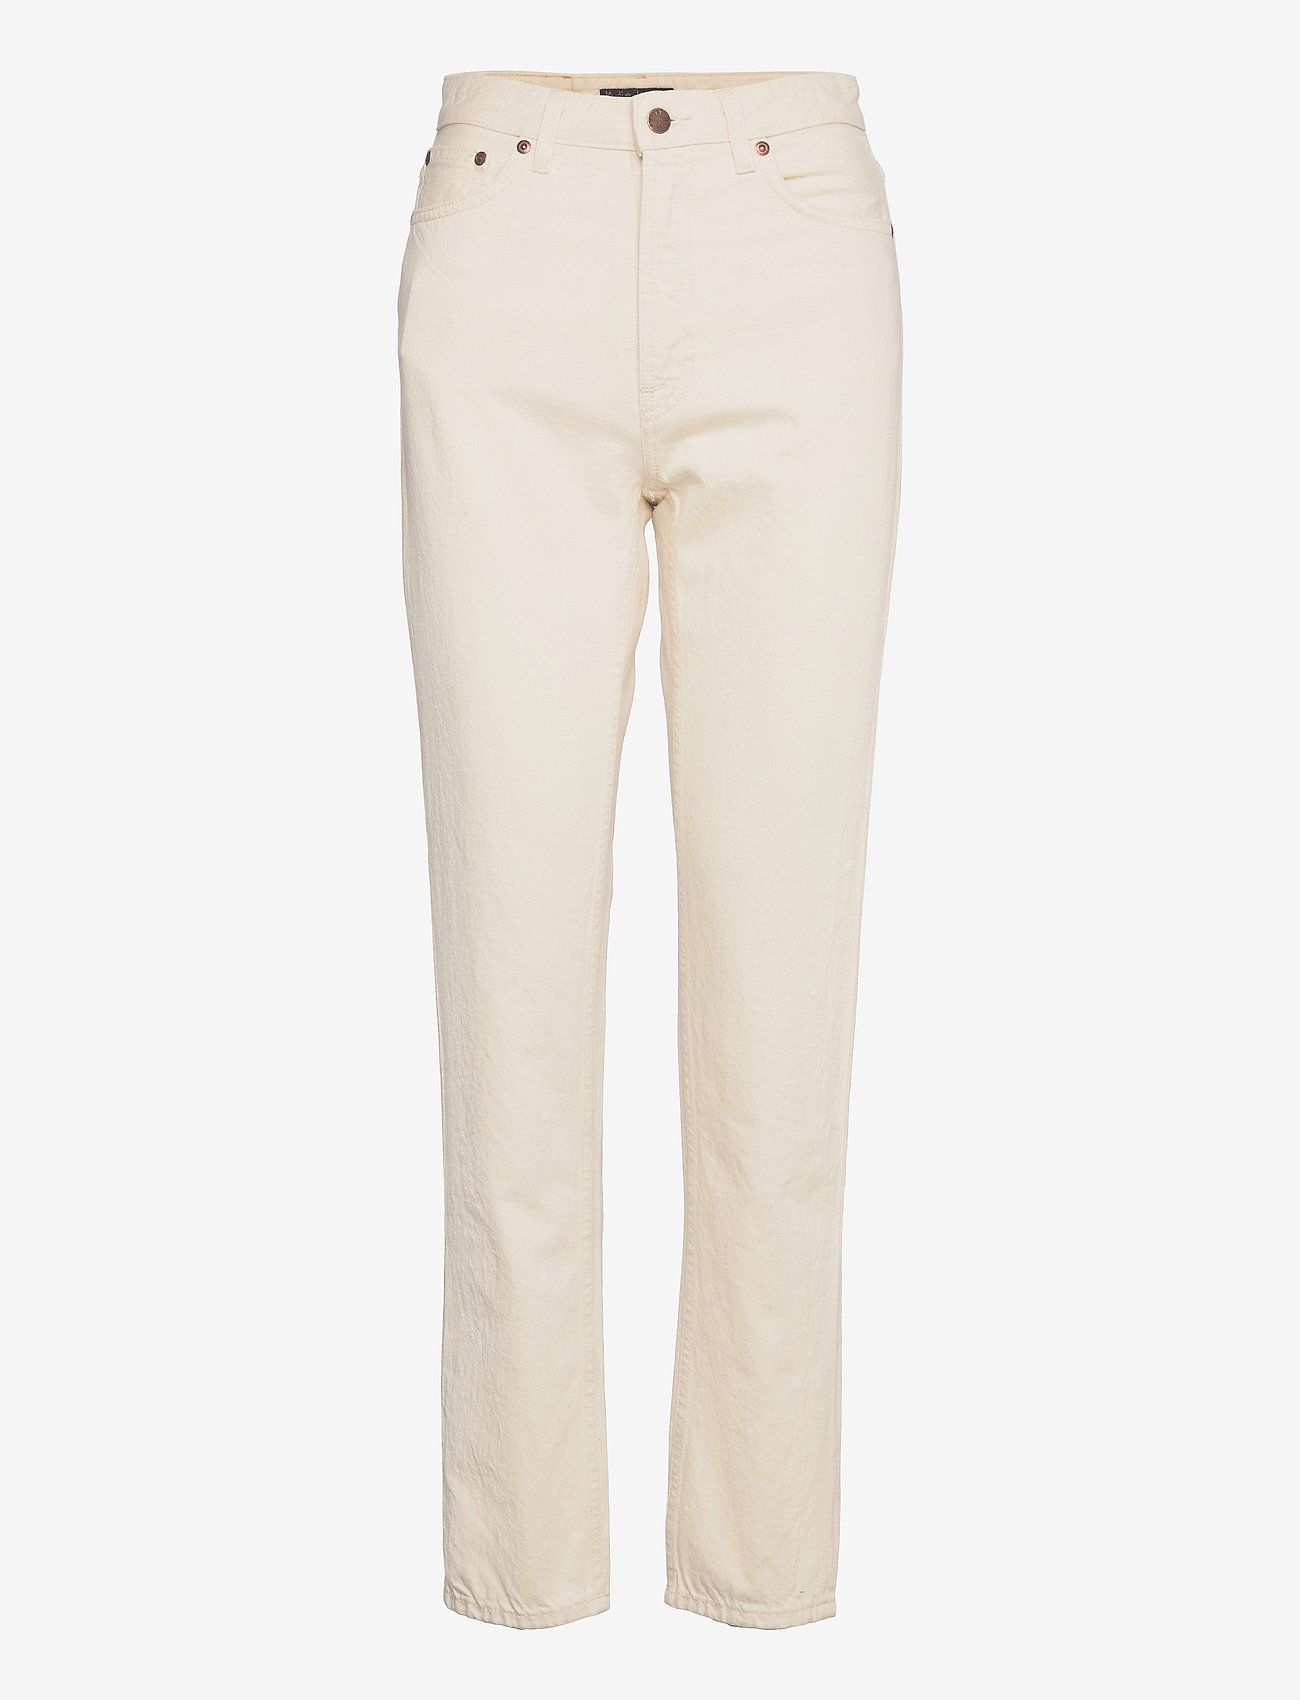 Nudie Jeans - Breezy Britt - straight regular - dusty white - 1